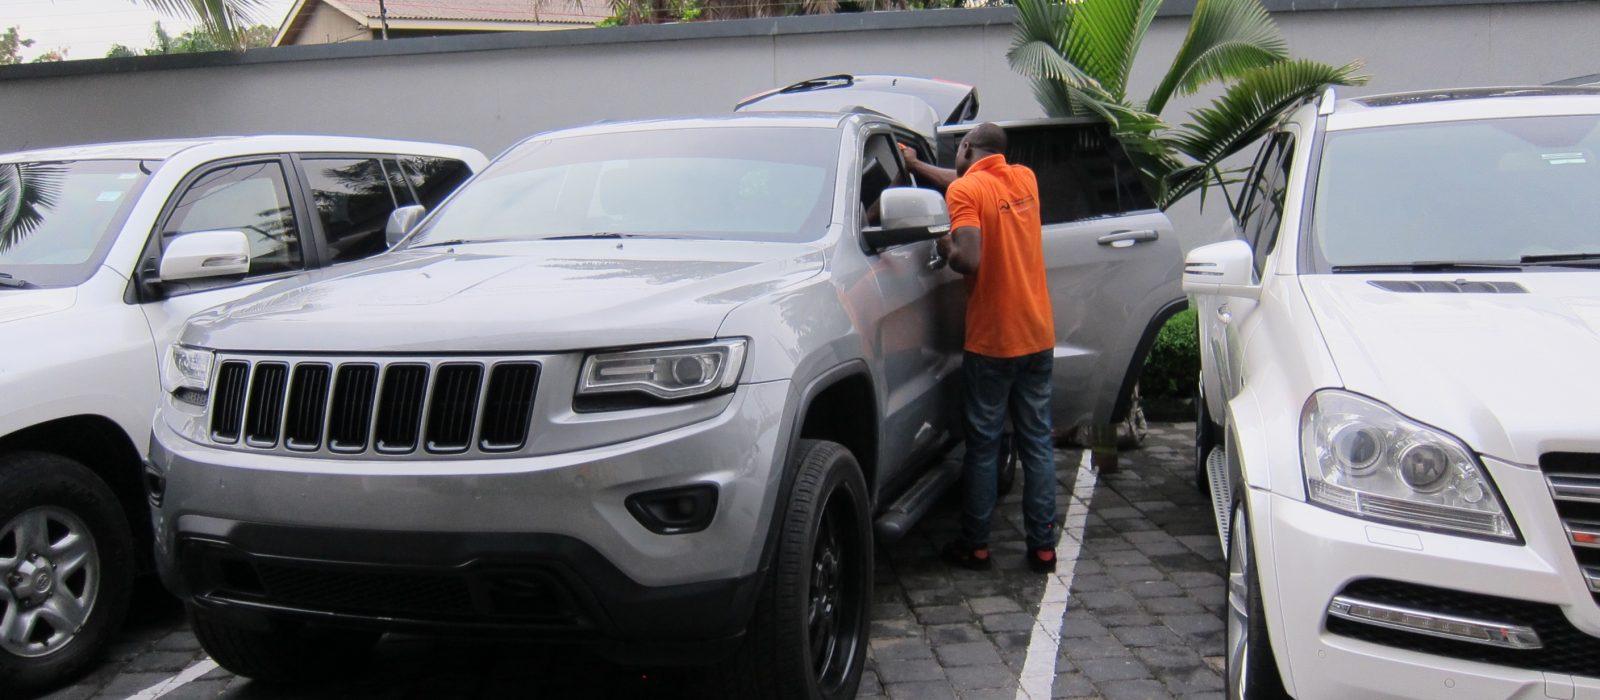 AUTOSPARKLE   Africa's No  1 Mobile Waterless Car Interior Wash